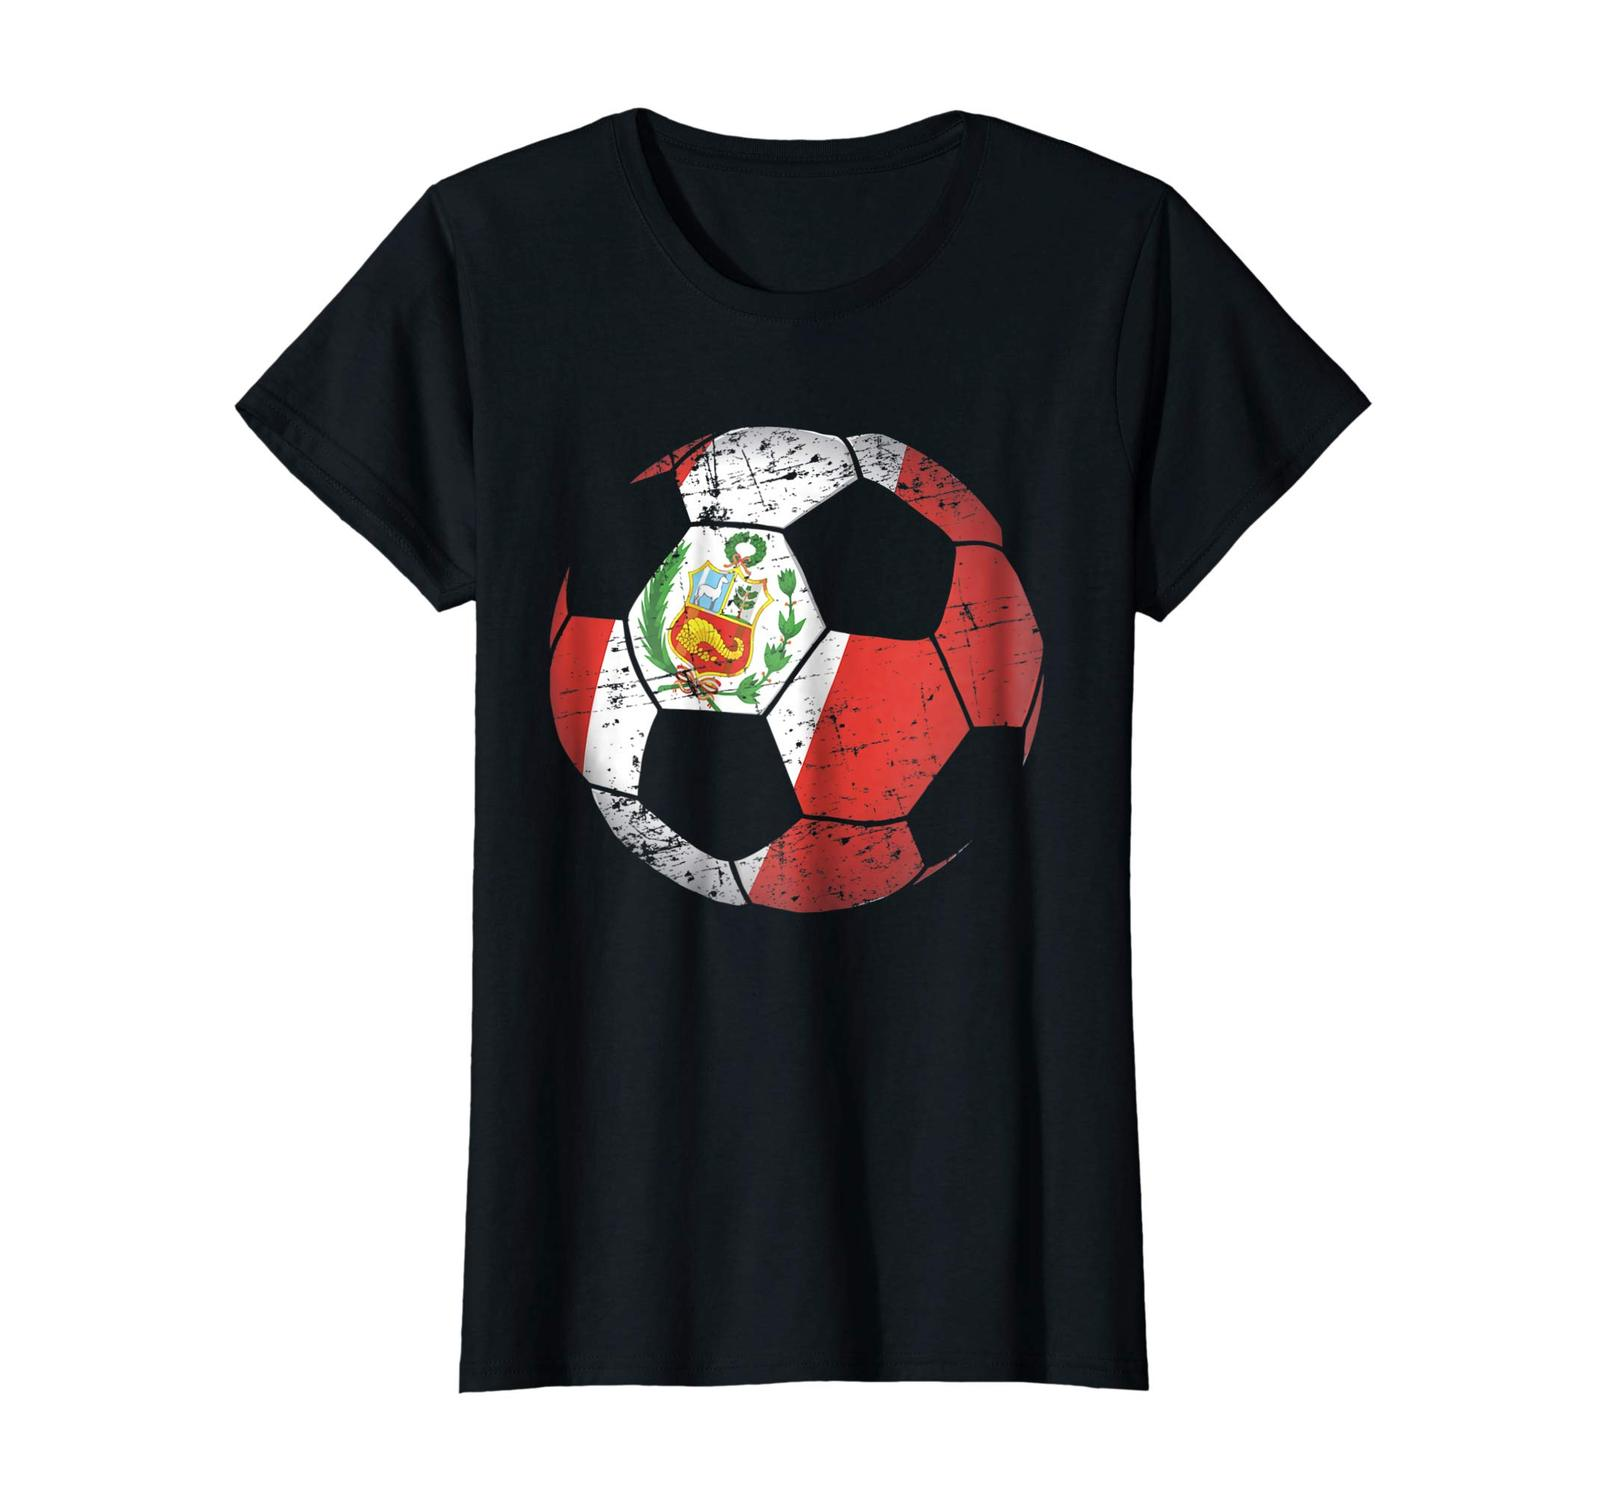 f86dc90838b Dad Shirts - Peru Soccer Ball Flag Jersey and 50 similar items.  A1xsstfklll. cla 7c2140 2000 7c91p6fsh8mkl.png 7c0 0 2140 2000 0.0 0.0  2140.0 2000.0